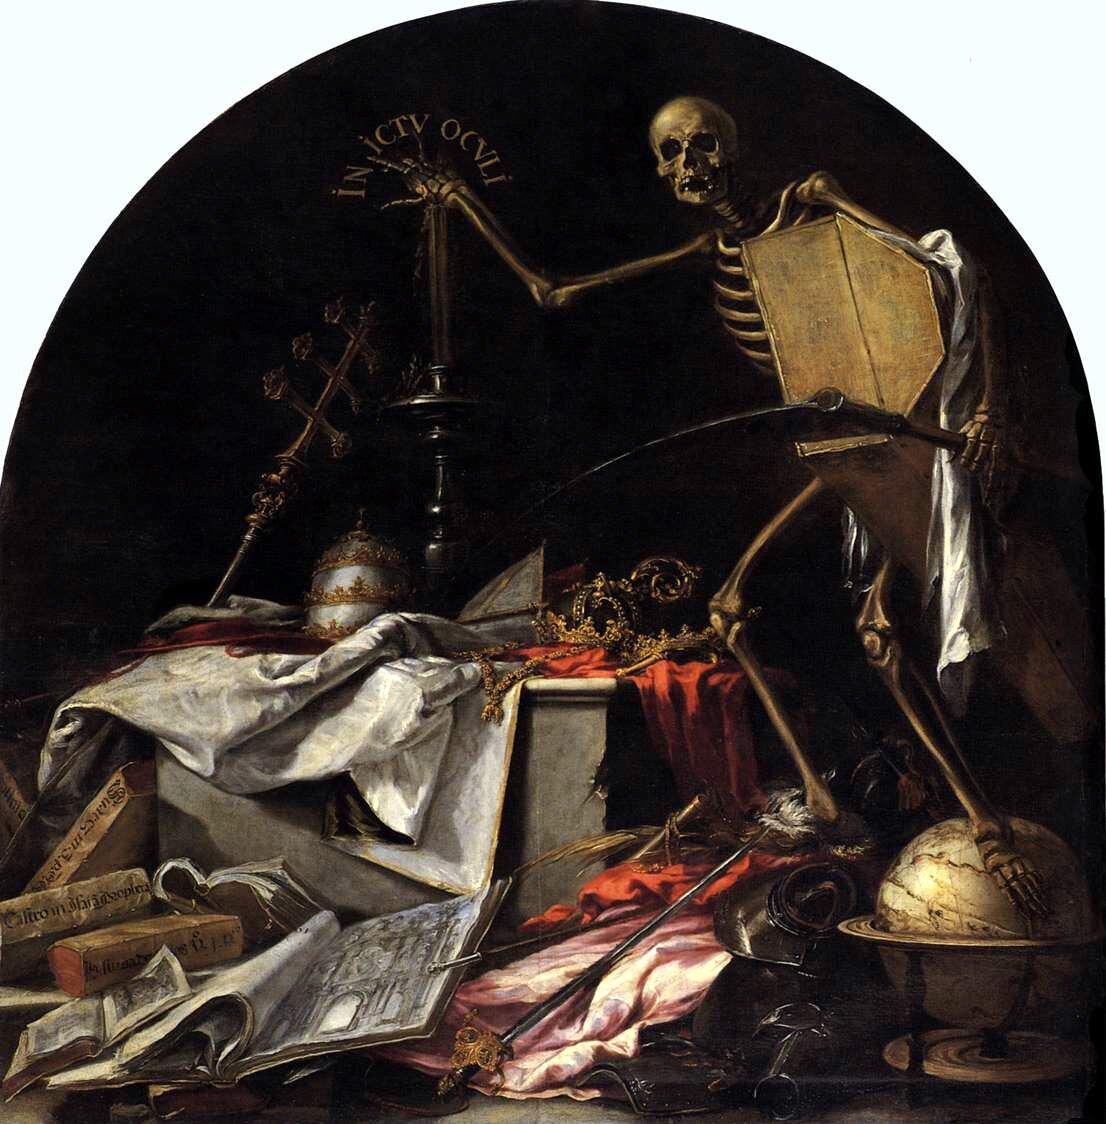 In ictu oculi Źródło: Juan Valdés Leal, In ictu oculi, 1672, olej na płótnie, Iglesia yHospital de la Caridad, Sewilla, domena publiczna.